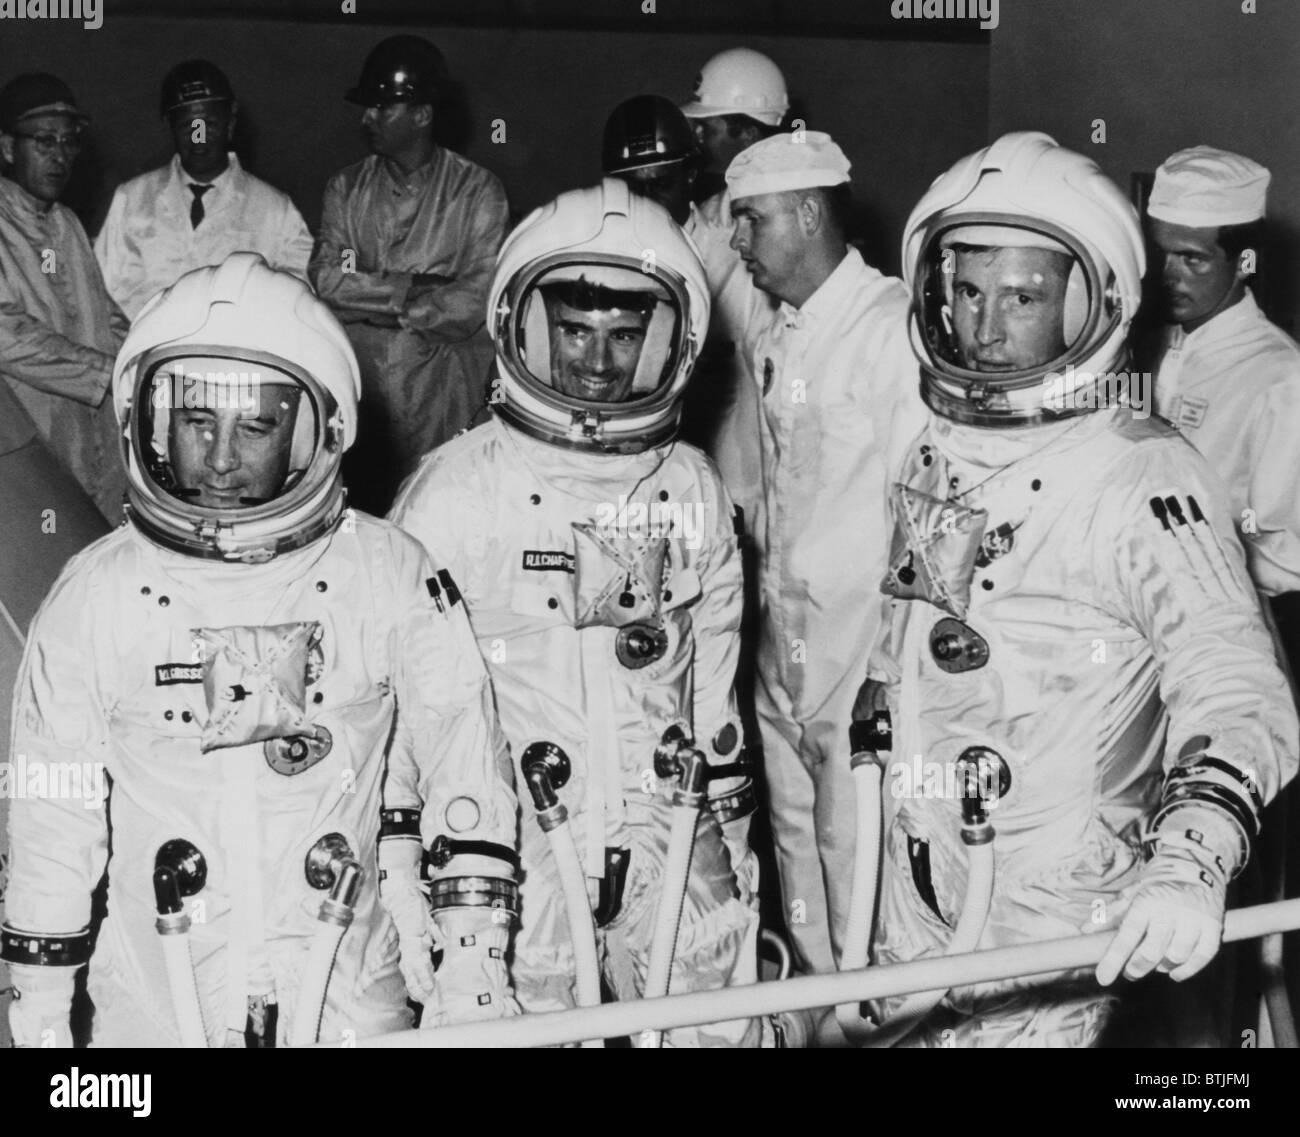 apollo space flight crews - photo #10